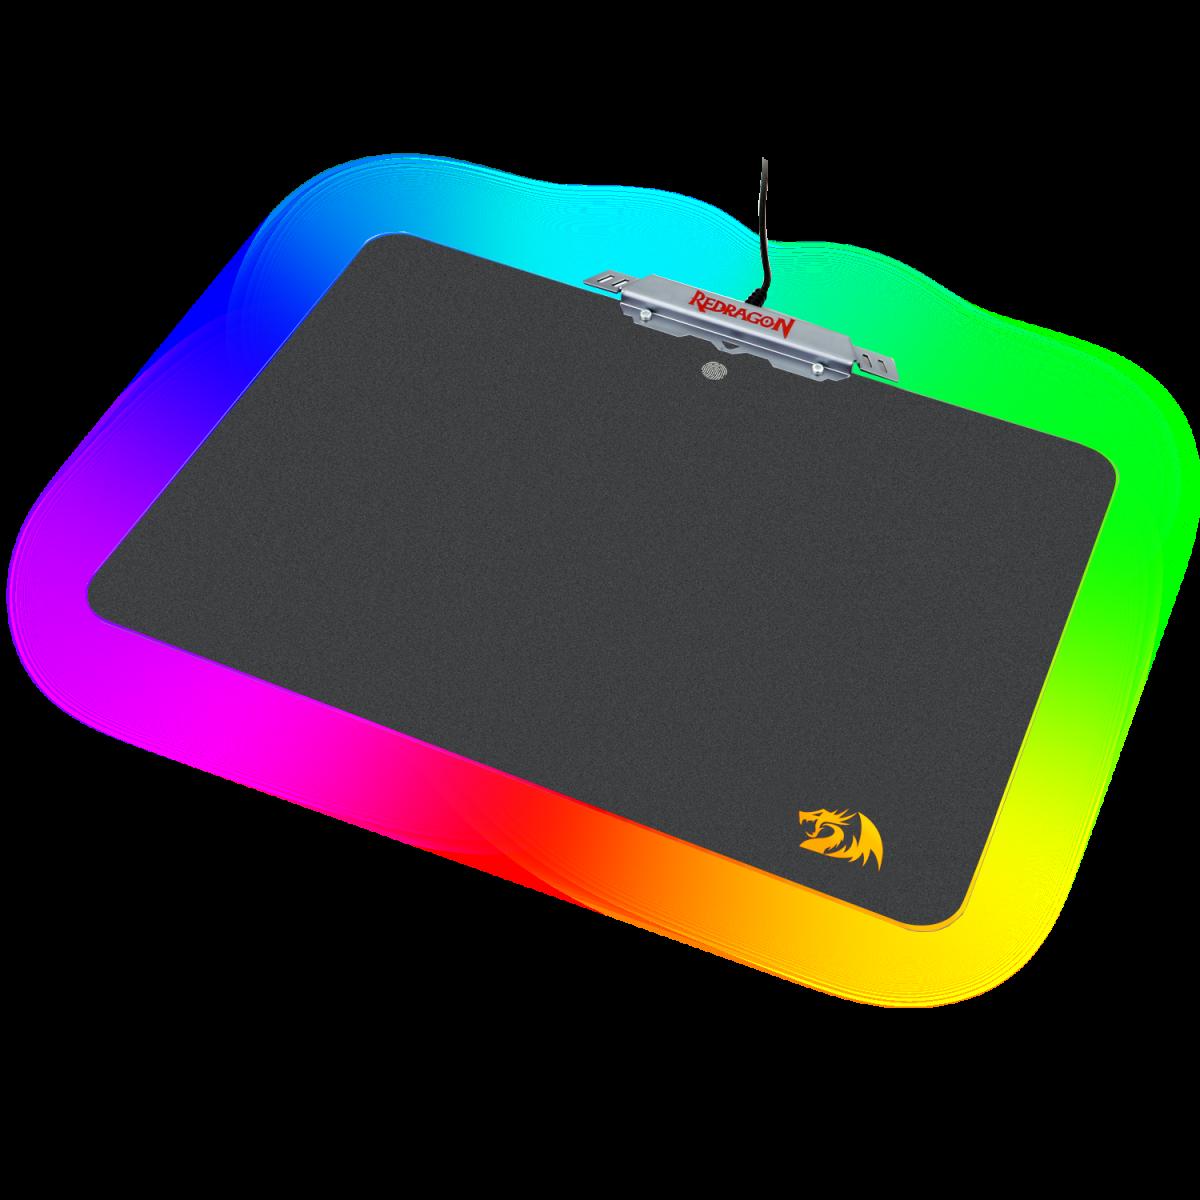 Mousepad Redragon Gamer Kylin P008 RGB